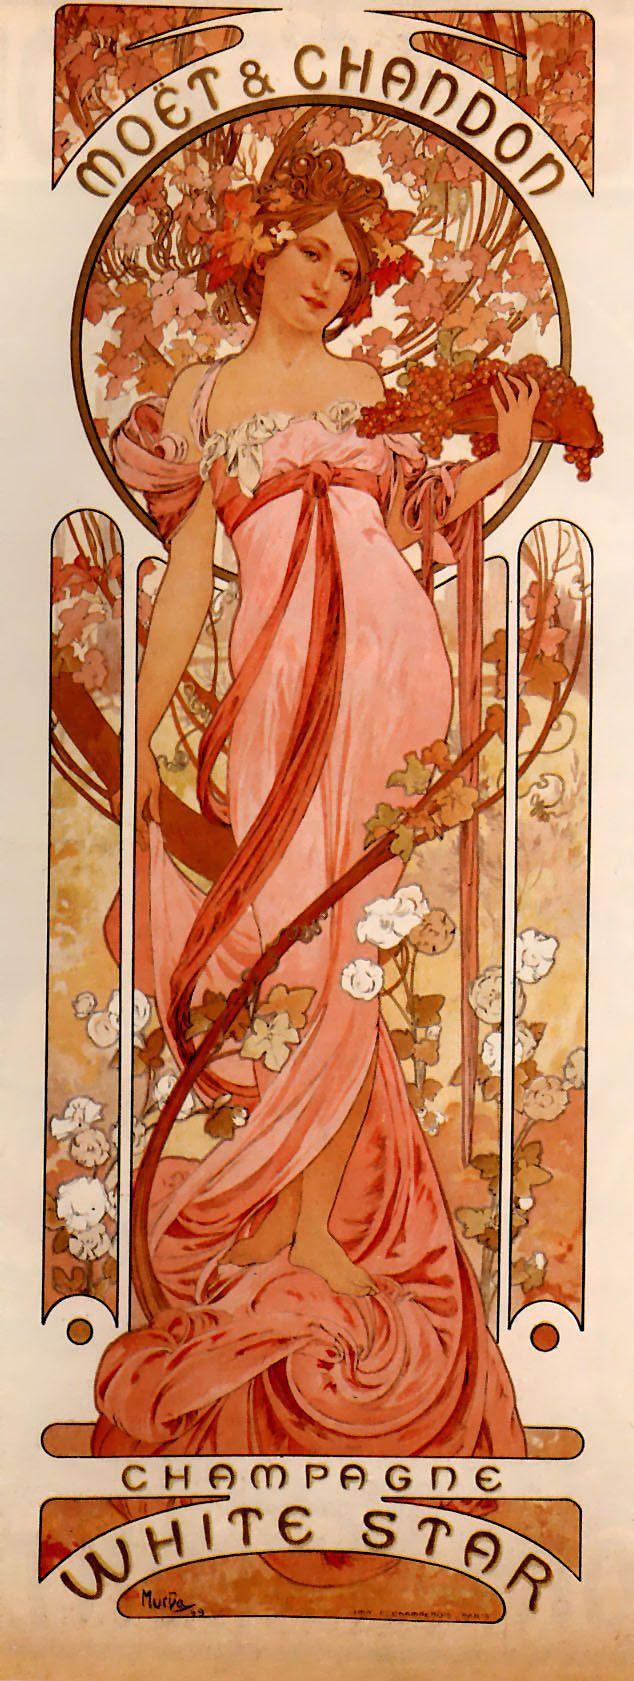 Moet & Chandon ~ 1899